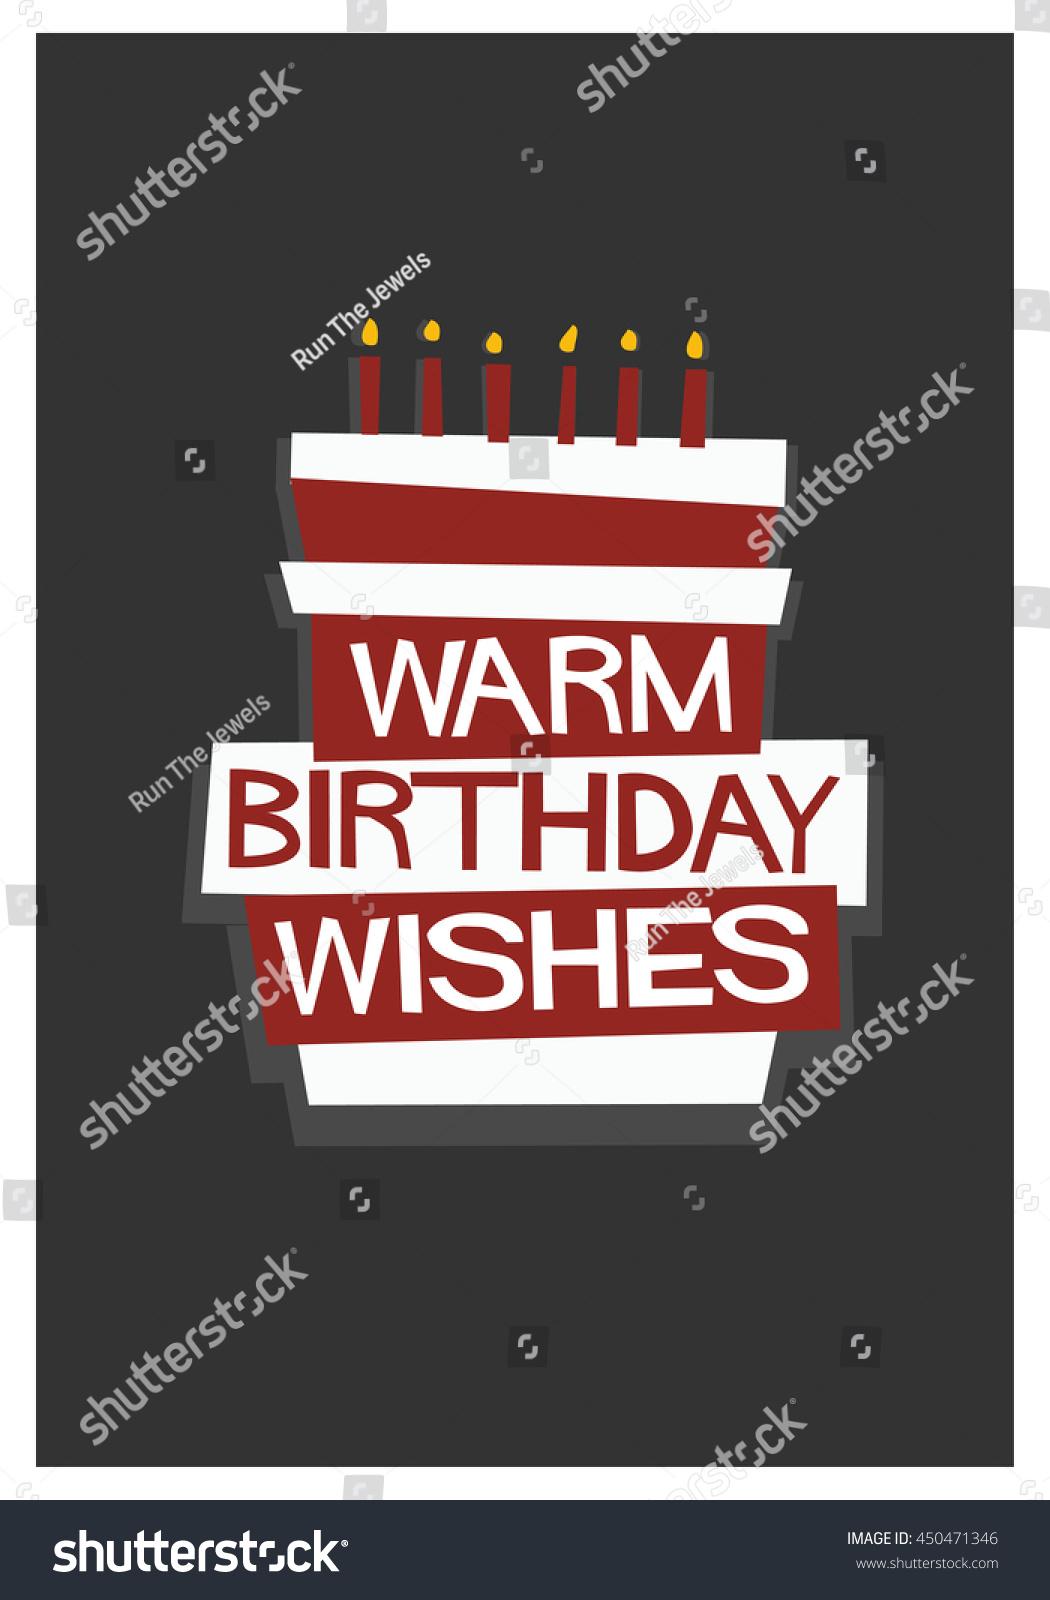 Warm Birthday Wishes Written On Cake Stock Vector 450471346